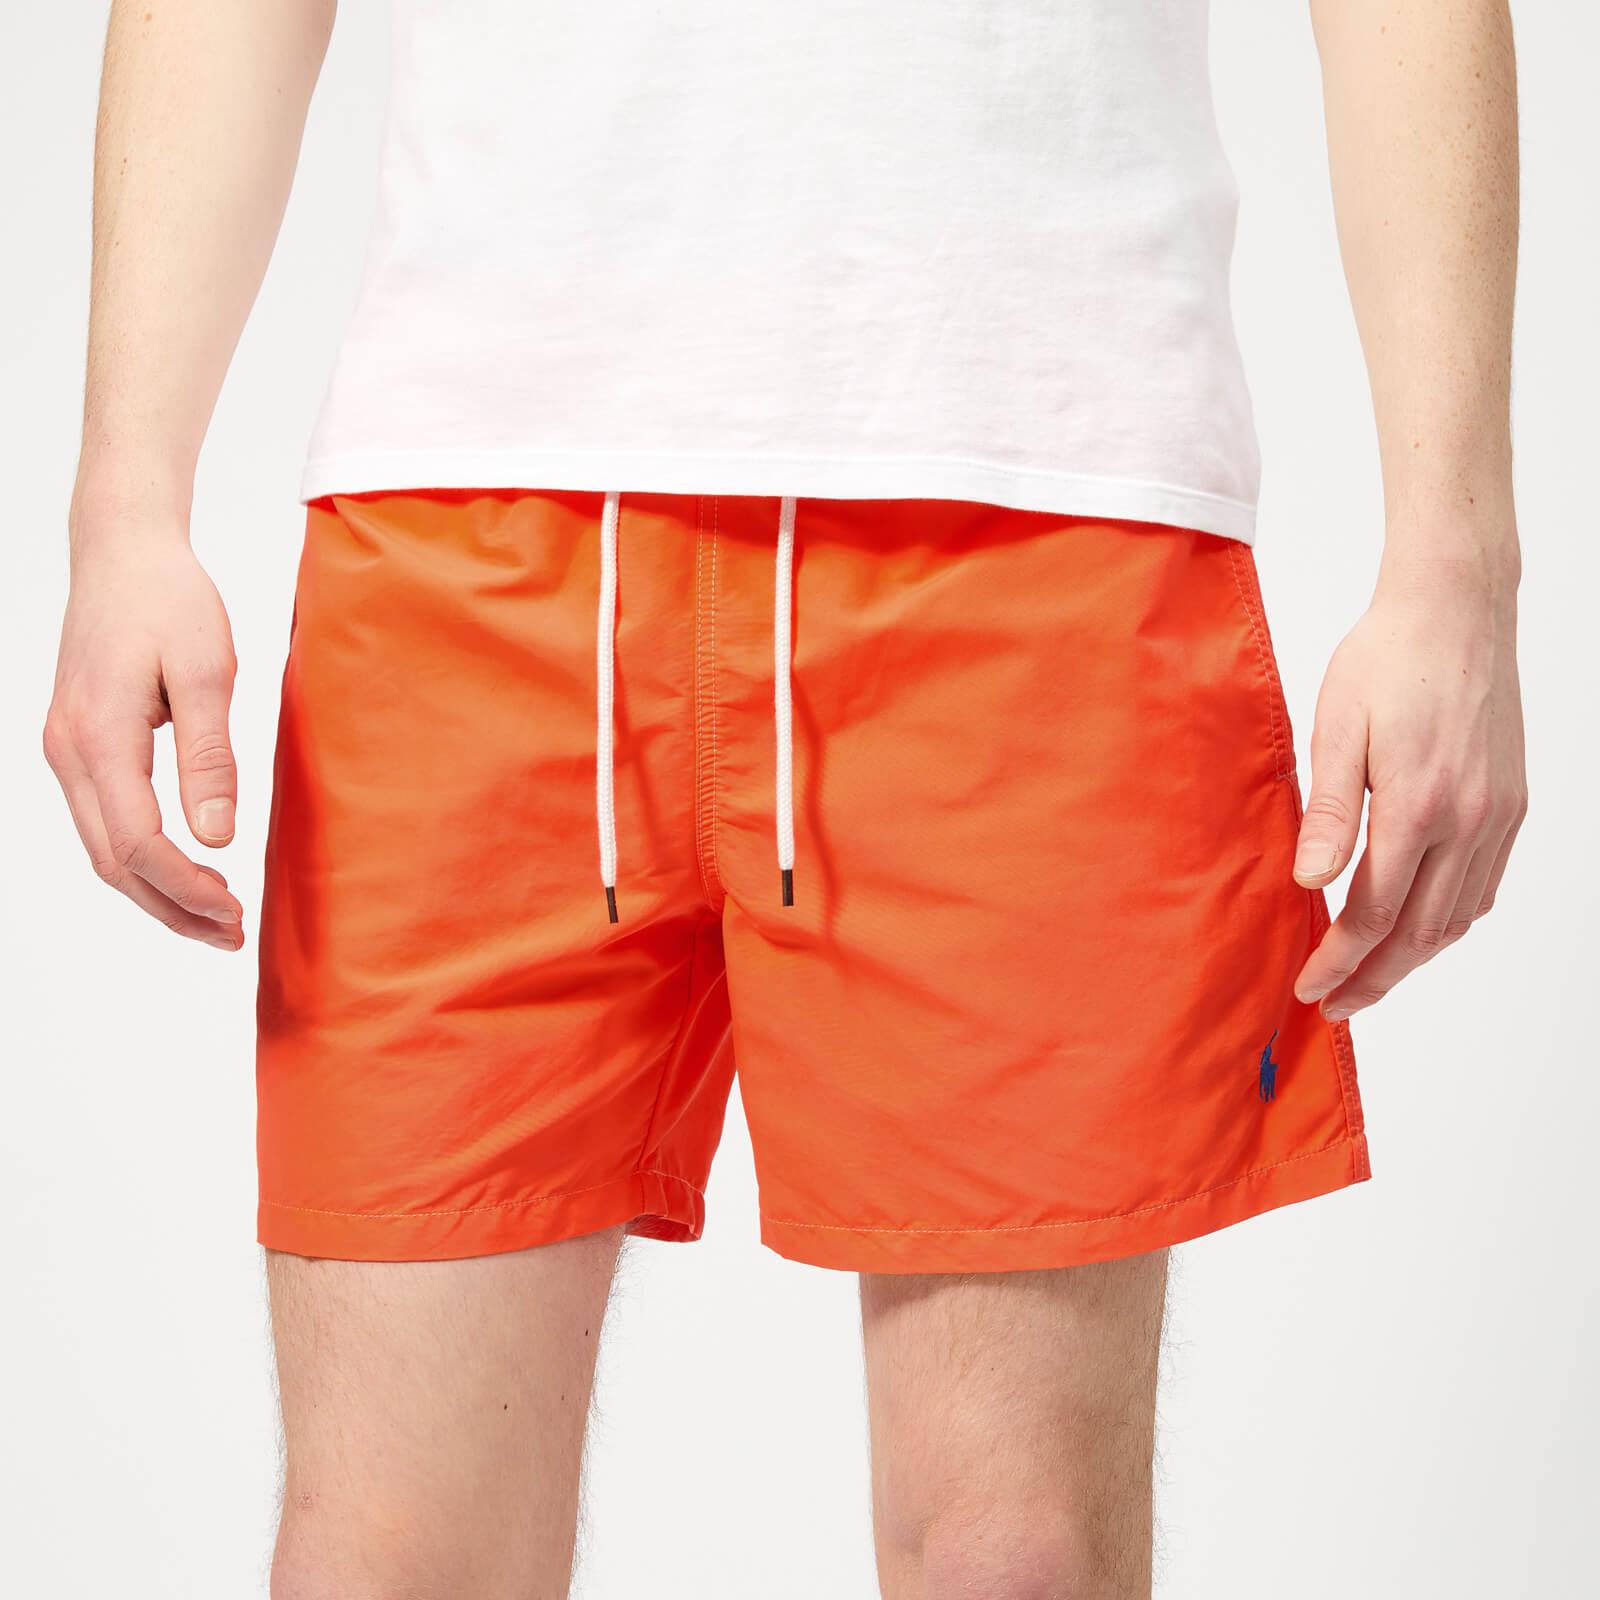 e9073a7151 Polo Ralph Lauren Men's Traveller Swim Shorts - Flare Orange - Free UK  Delivery over £50